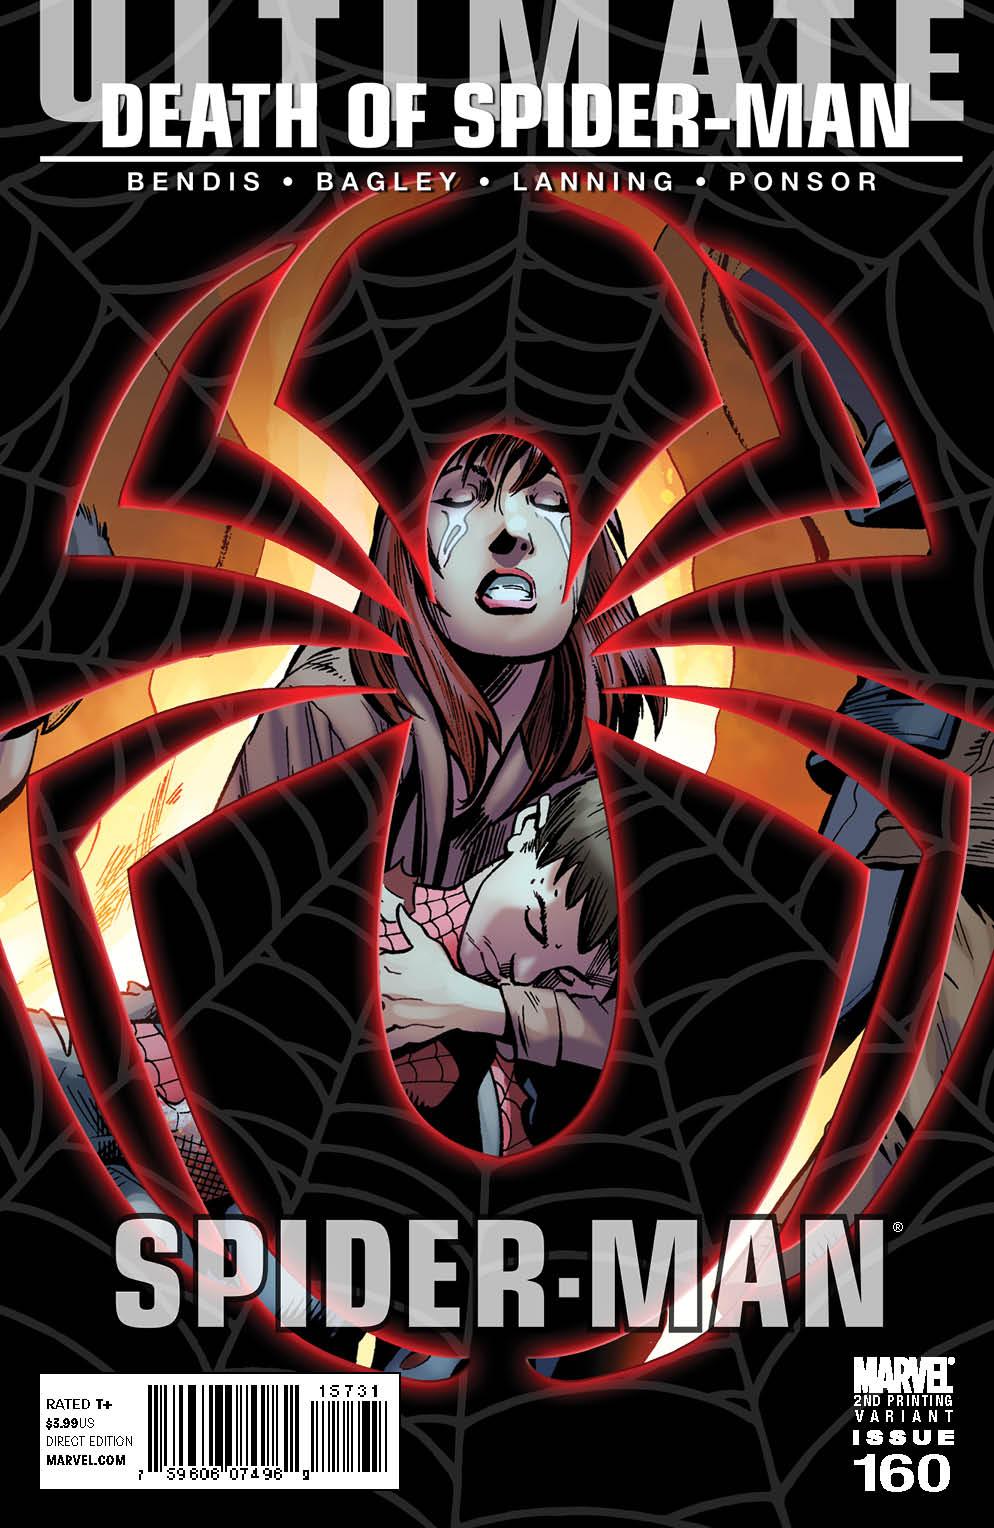 UltimateComicsSpiderMan_160_2nd ULTIMATE COMICS SPIDER-MAN #160 gets second printing